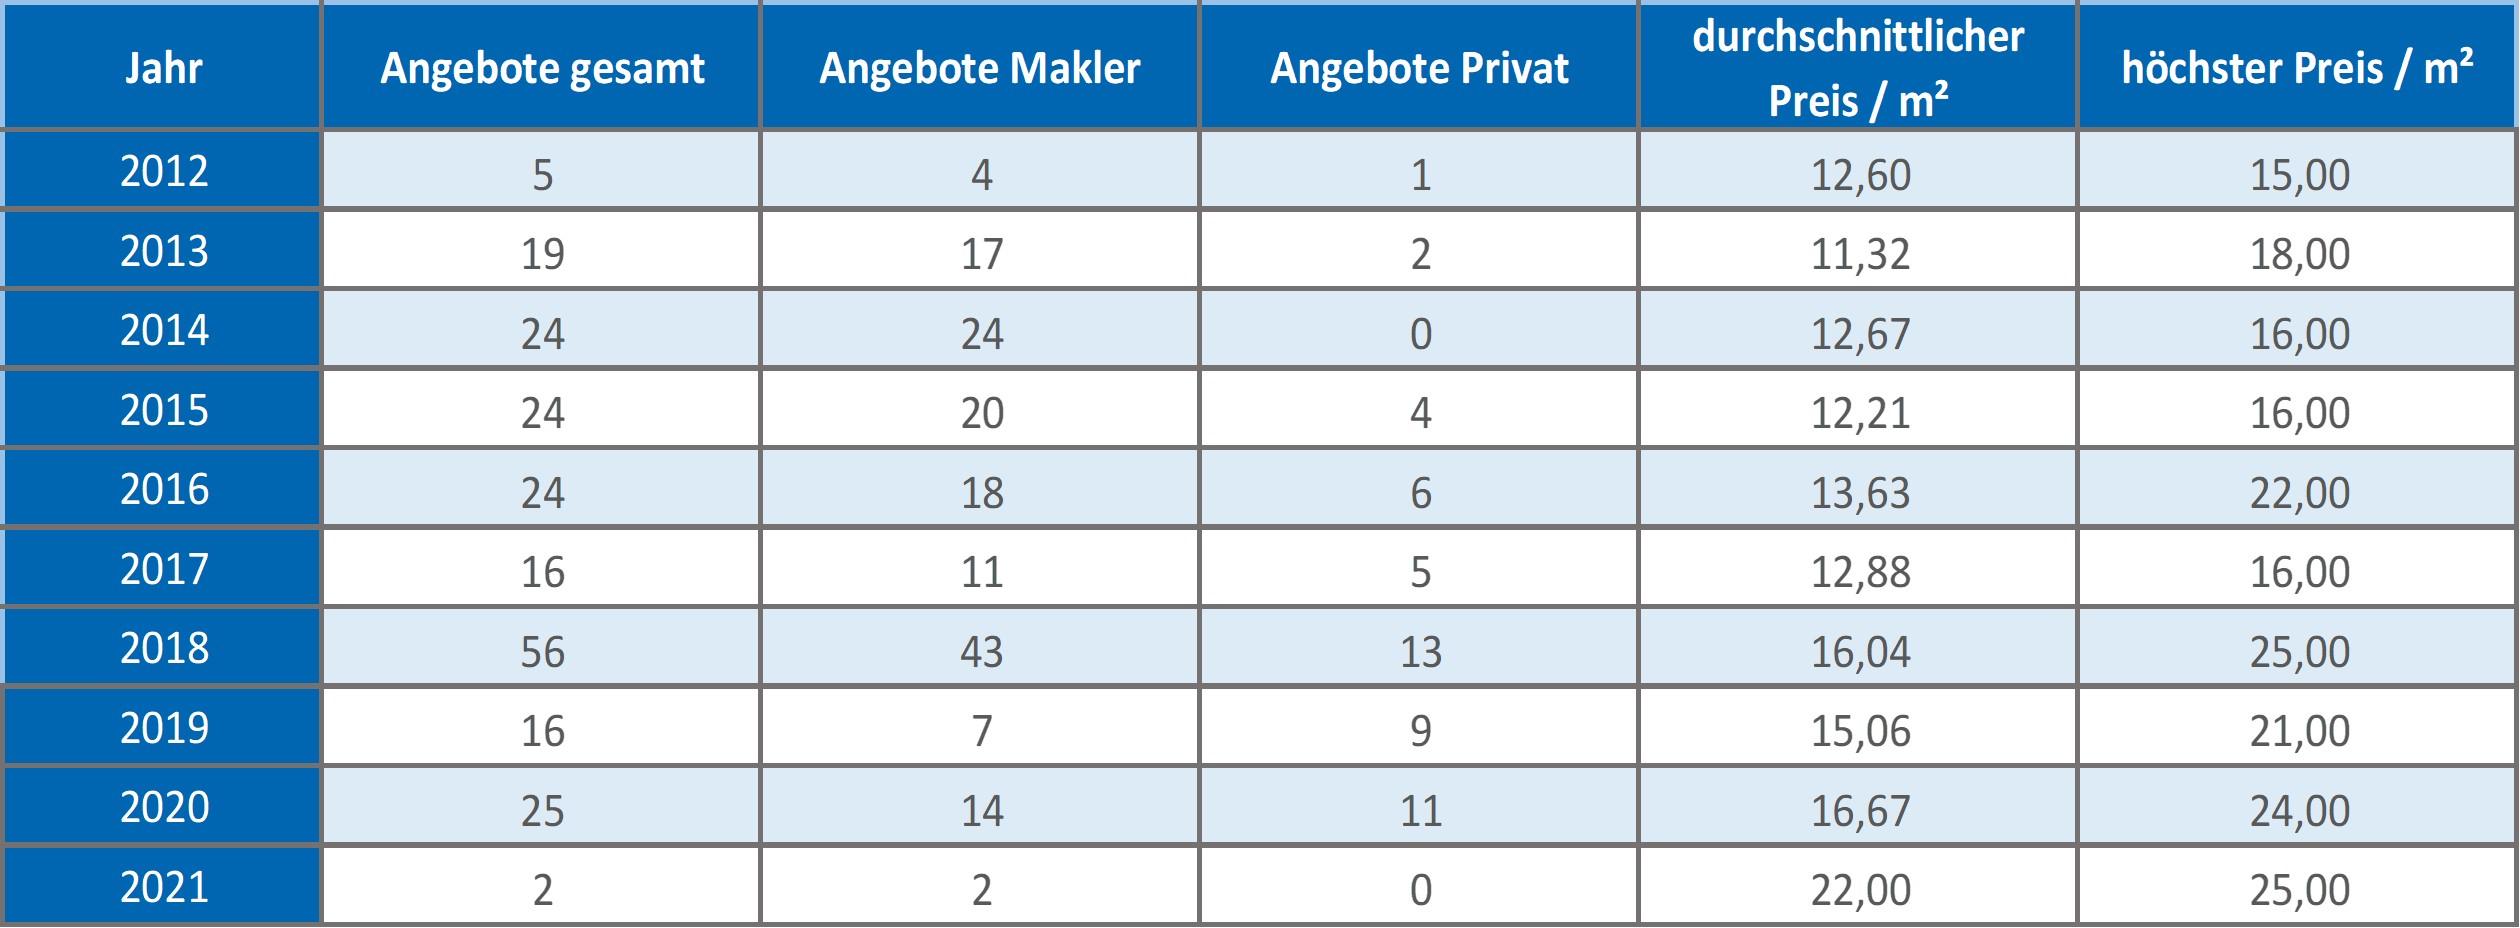 Straßlach - Dingharting Wohnung mieten vermieten Preis Bewertung Makler 2019 2020 2021 www.happy-immo.de